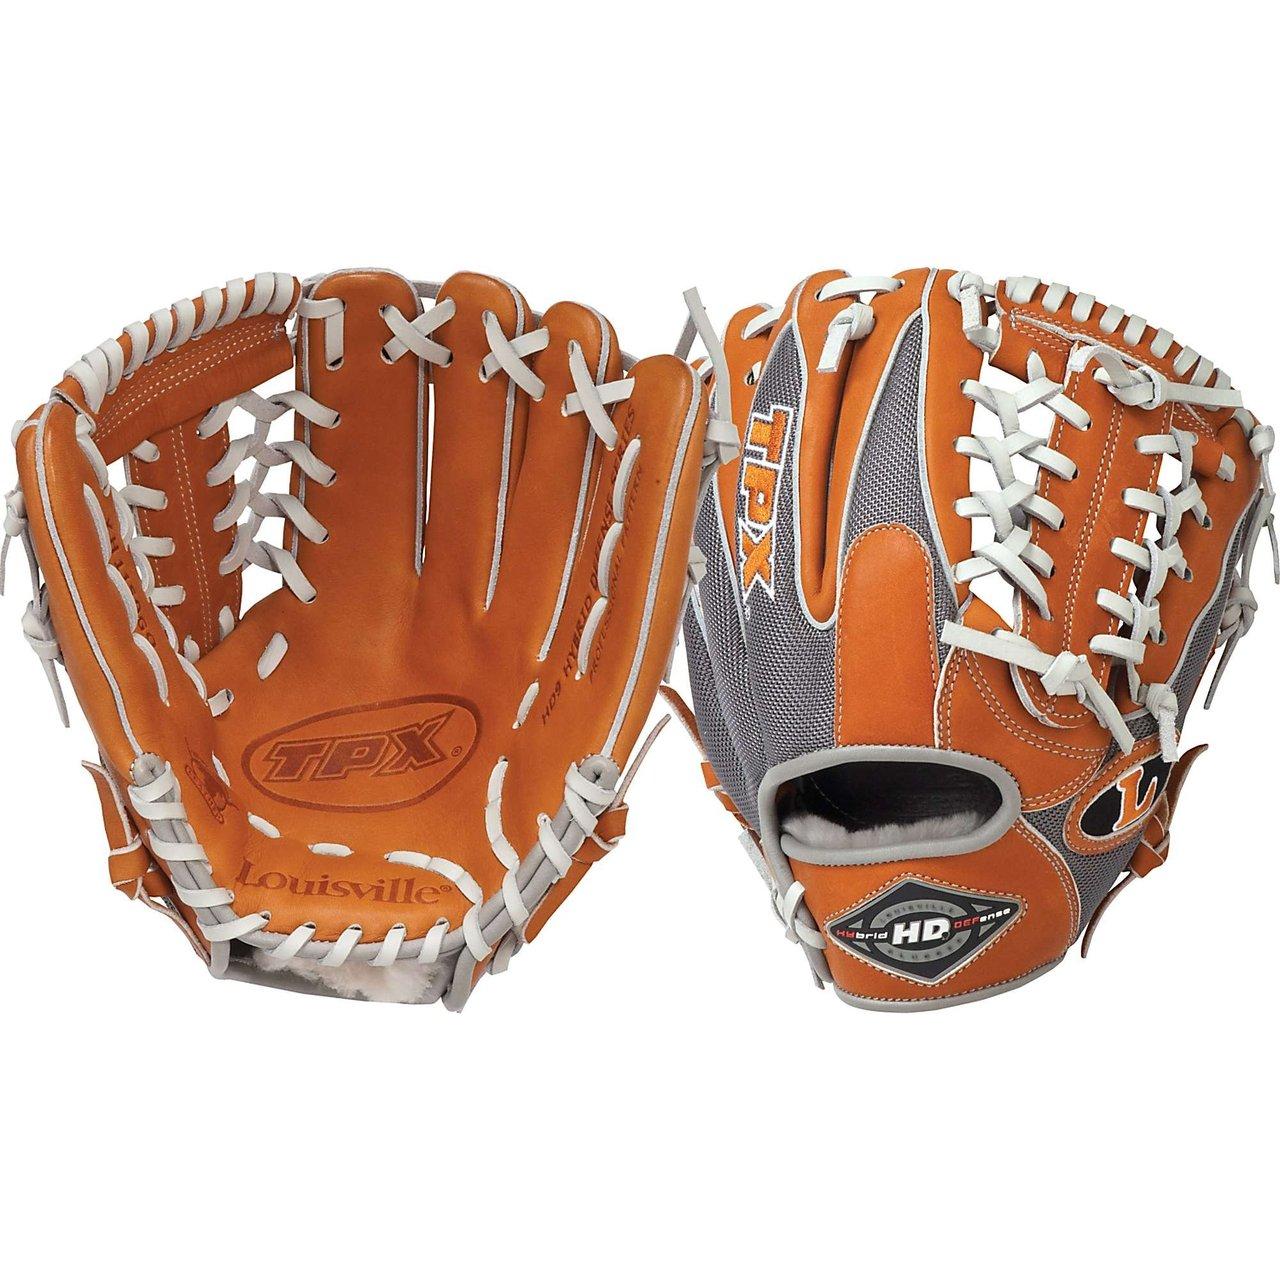 louisville-slugger-xh1150go-11-1-2-inch-baseball-glove-left-hand-throw XH1150GORH Louisville Slugger New Louisville Slugger XH1150GO 11 12 Inch Baseball Glove Left Hand Throw